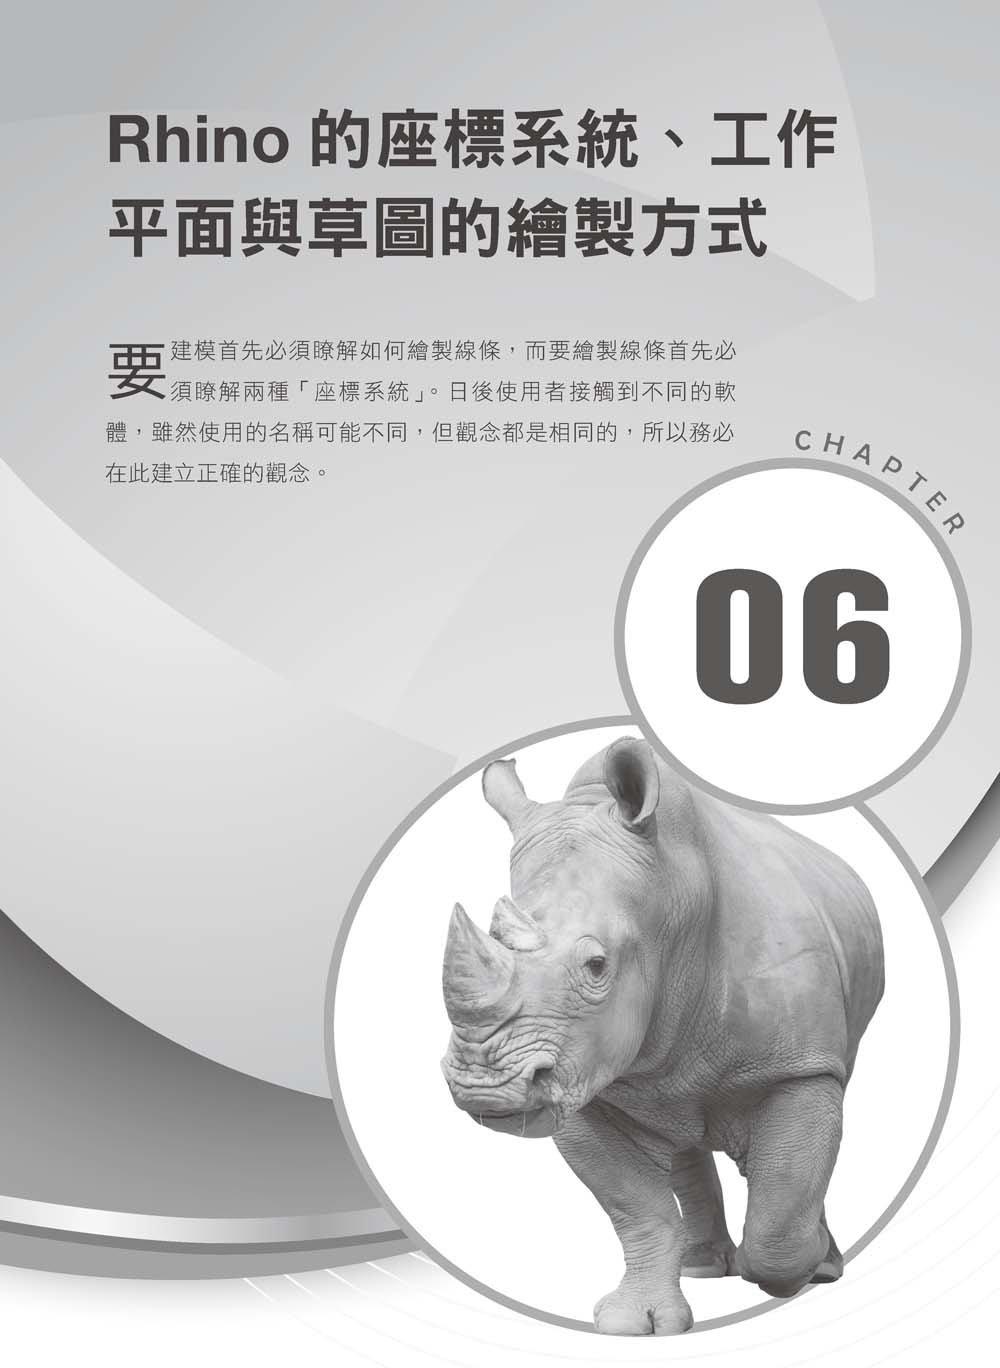 Rhinoceros 6 全攻略:自學設計與 3D建模寶典-preview-20